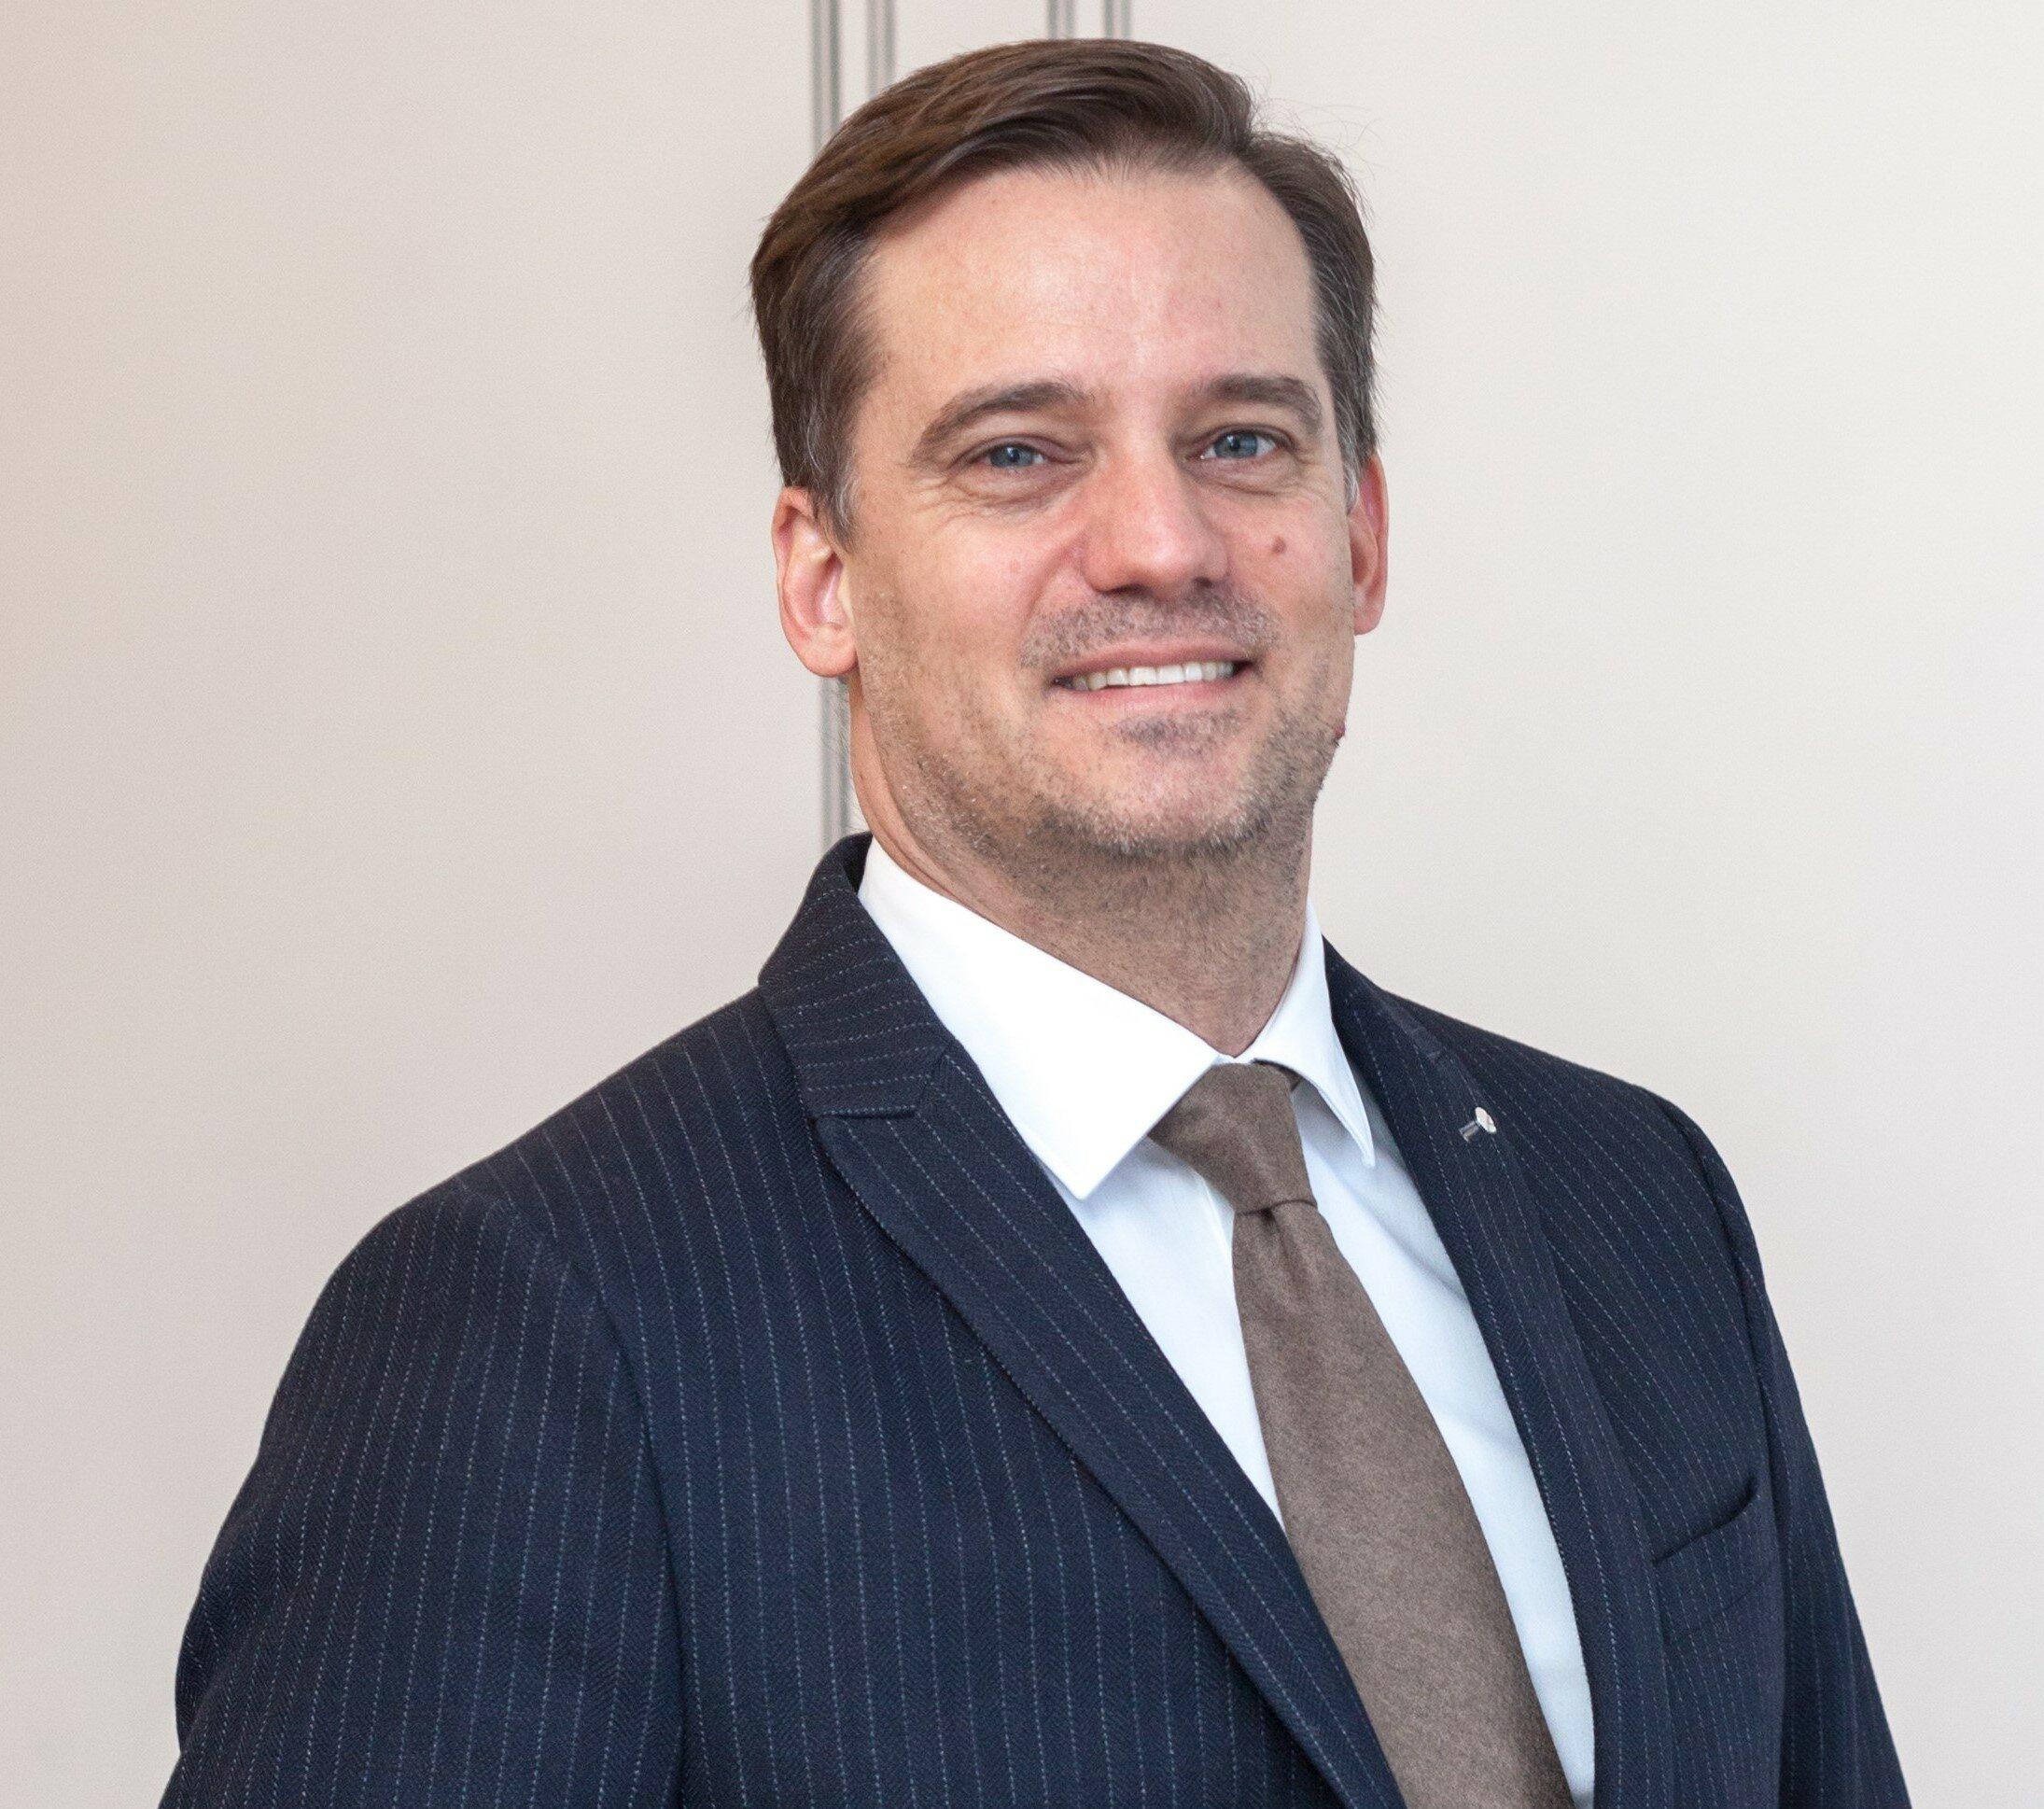 Clemens C. Lehr – Złota 44